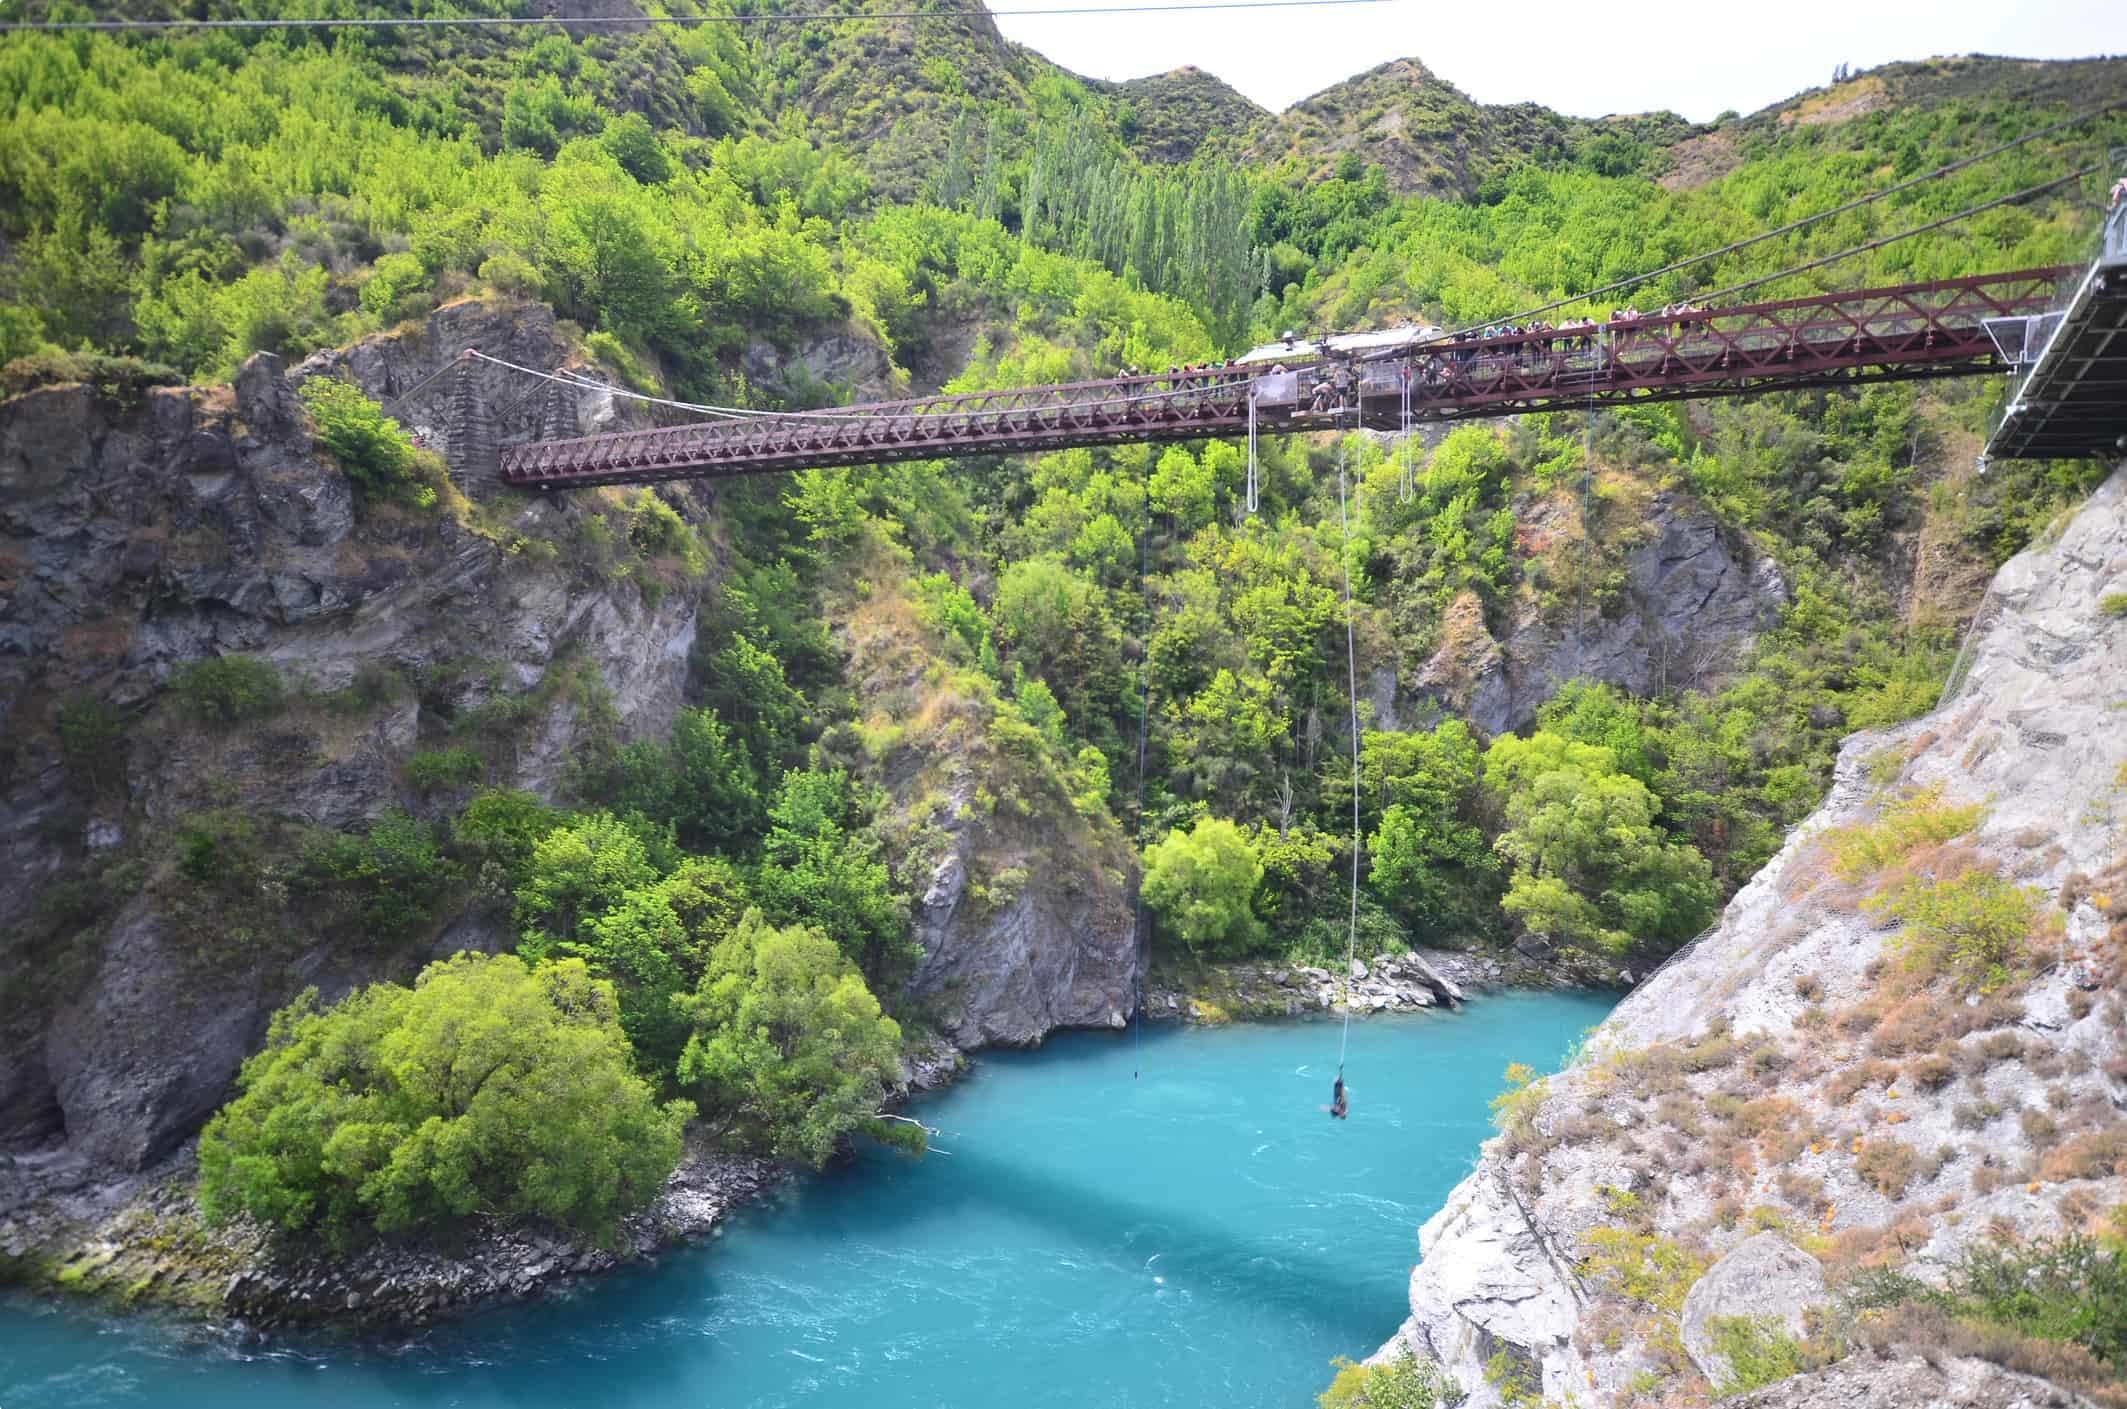 Bungee jumping at Kawarau Bridge, New Zealand